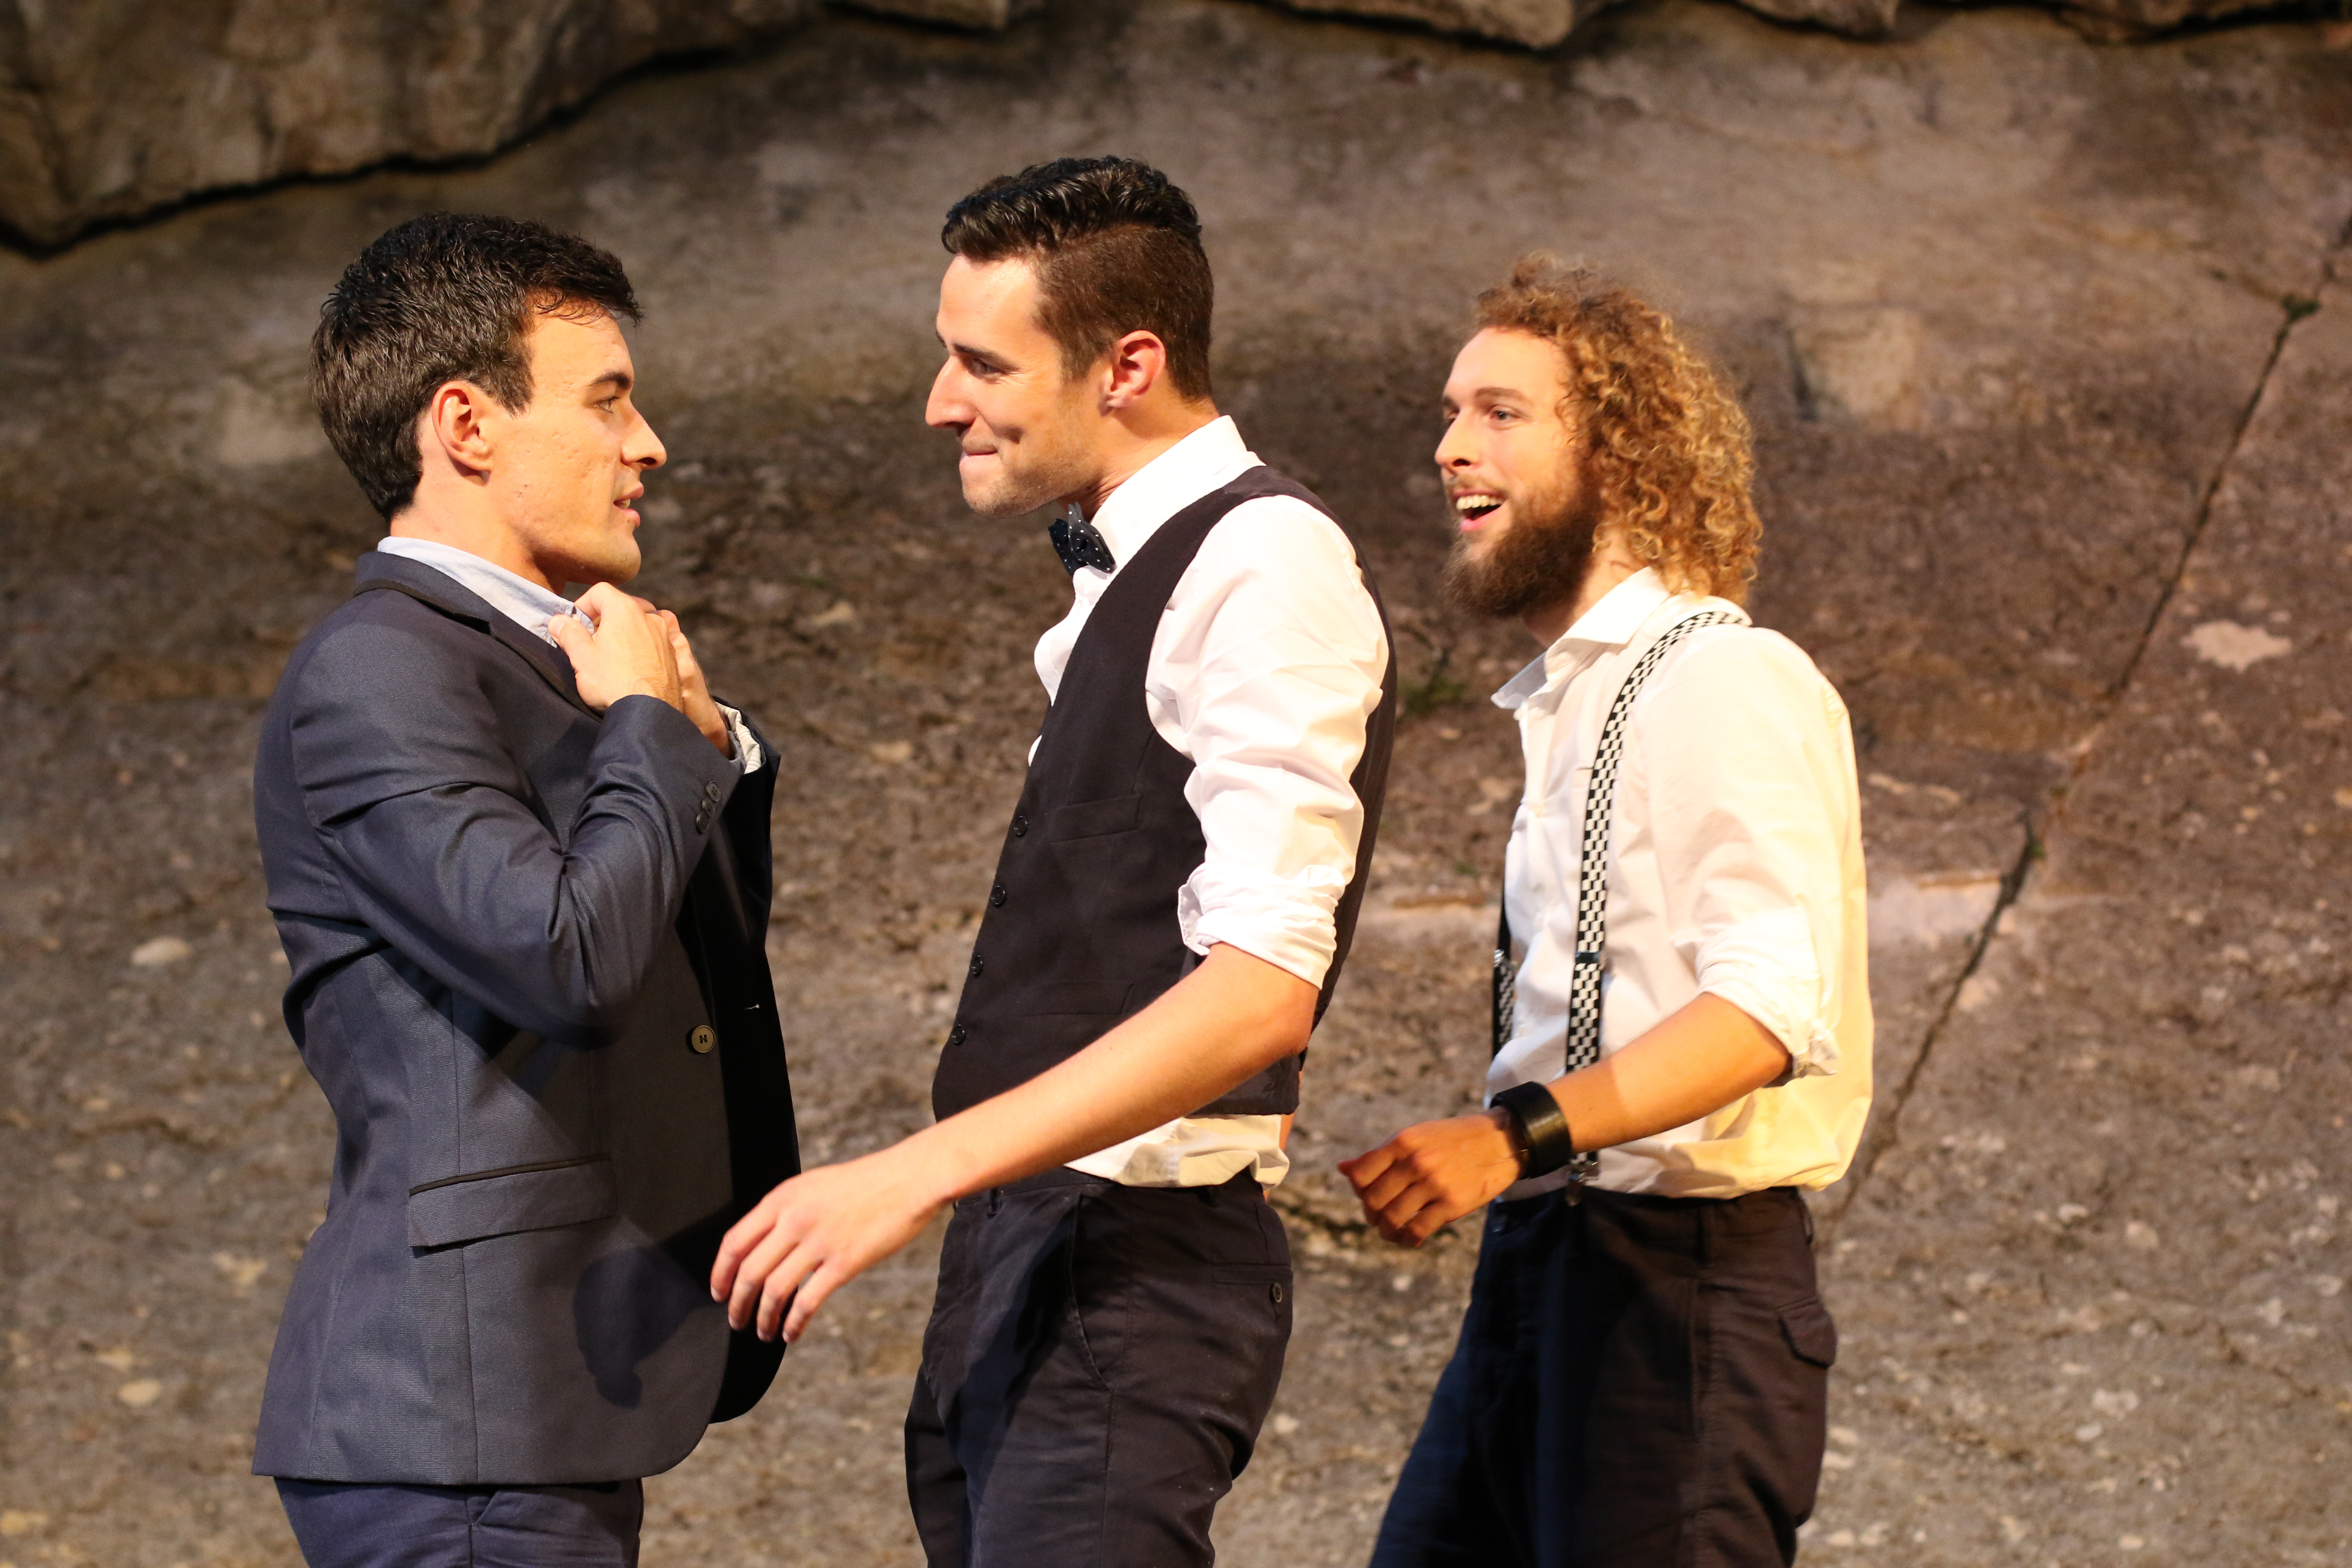 Romeo, Mercutio, Benvolio